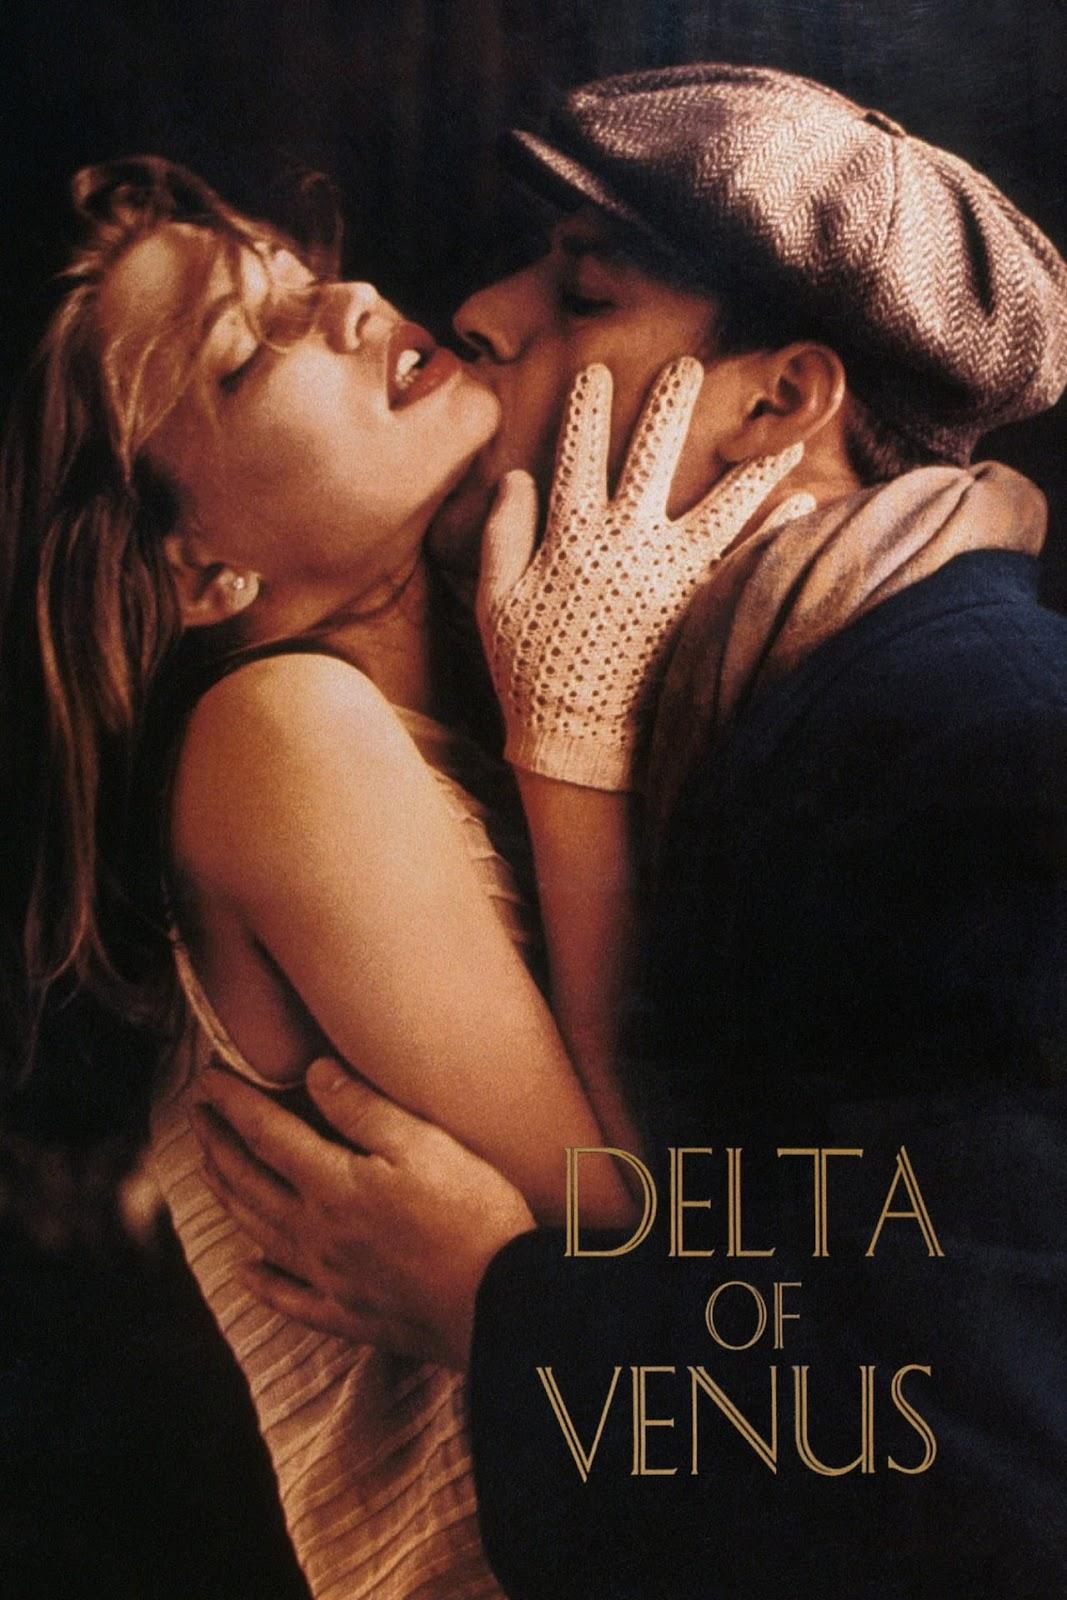 Delta of Venus Full USA 18+ Adult Movie Online Free